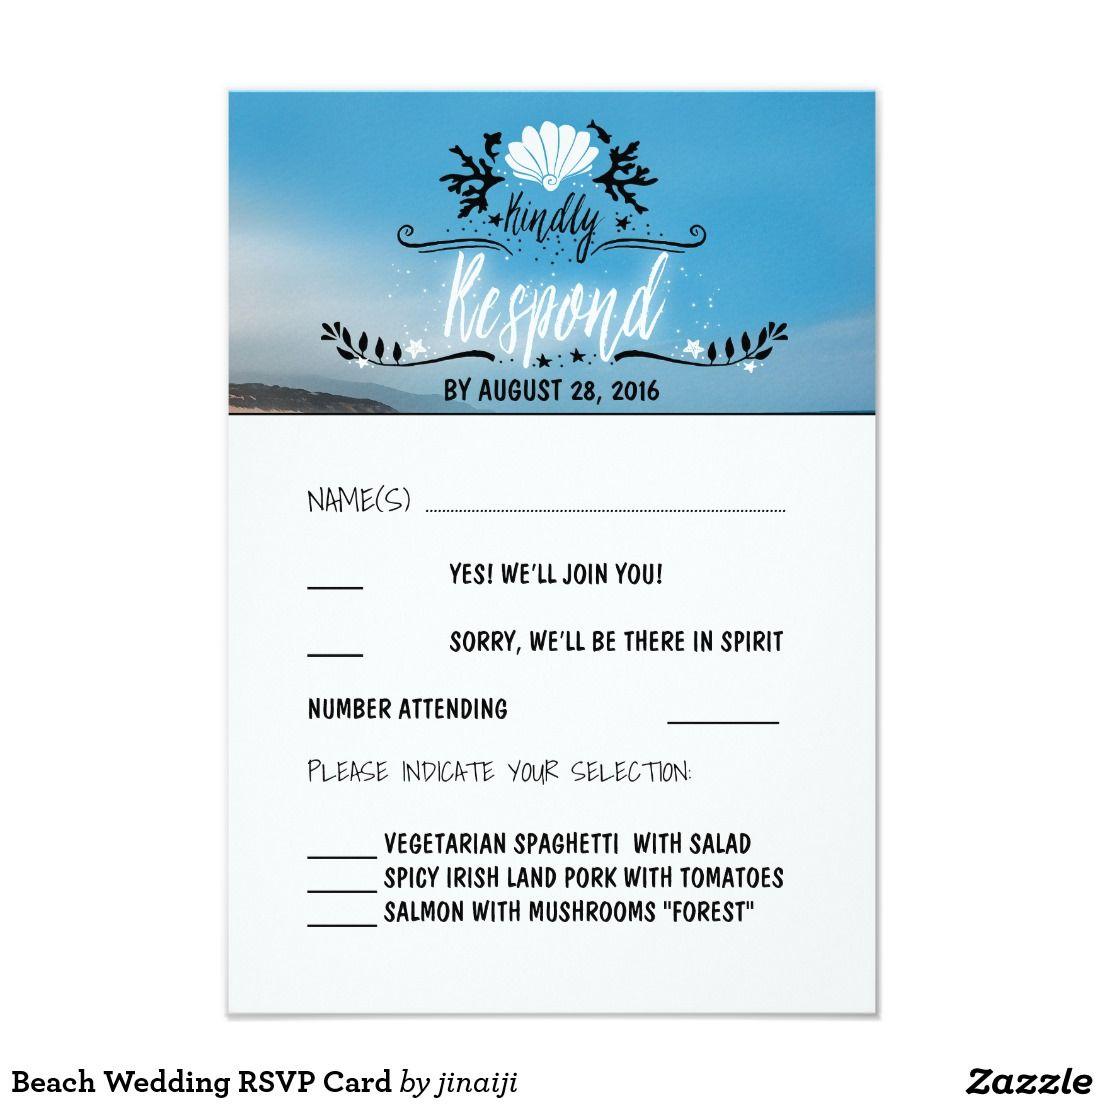 Beach Wedding RSVP Card | Beach Wedding Invitations | Pinterest ...